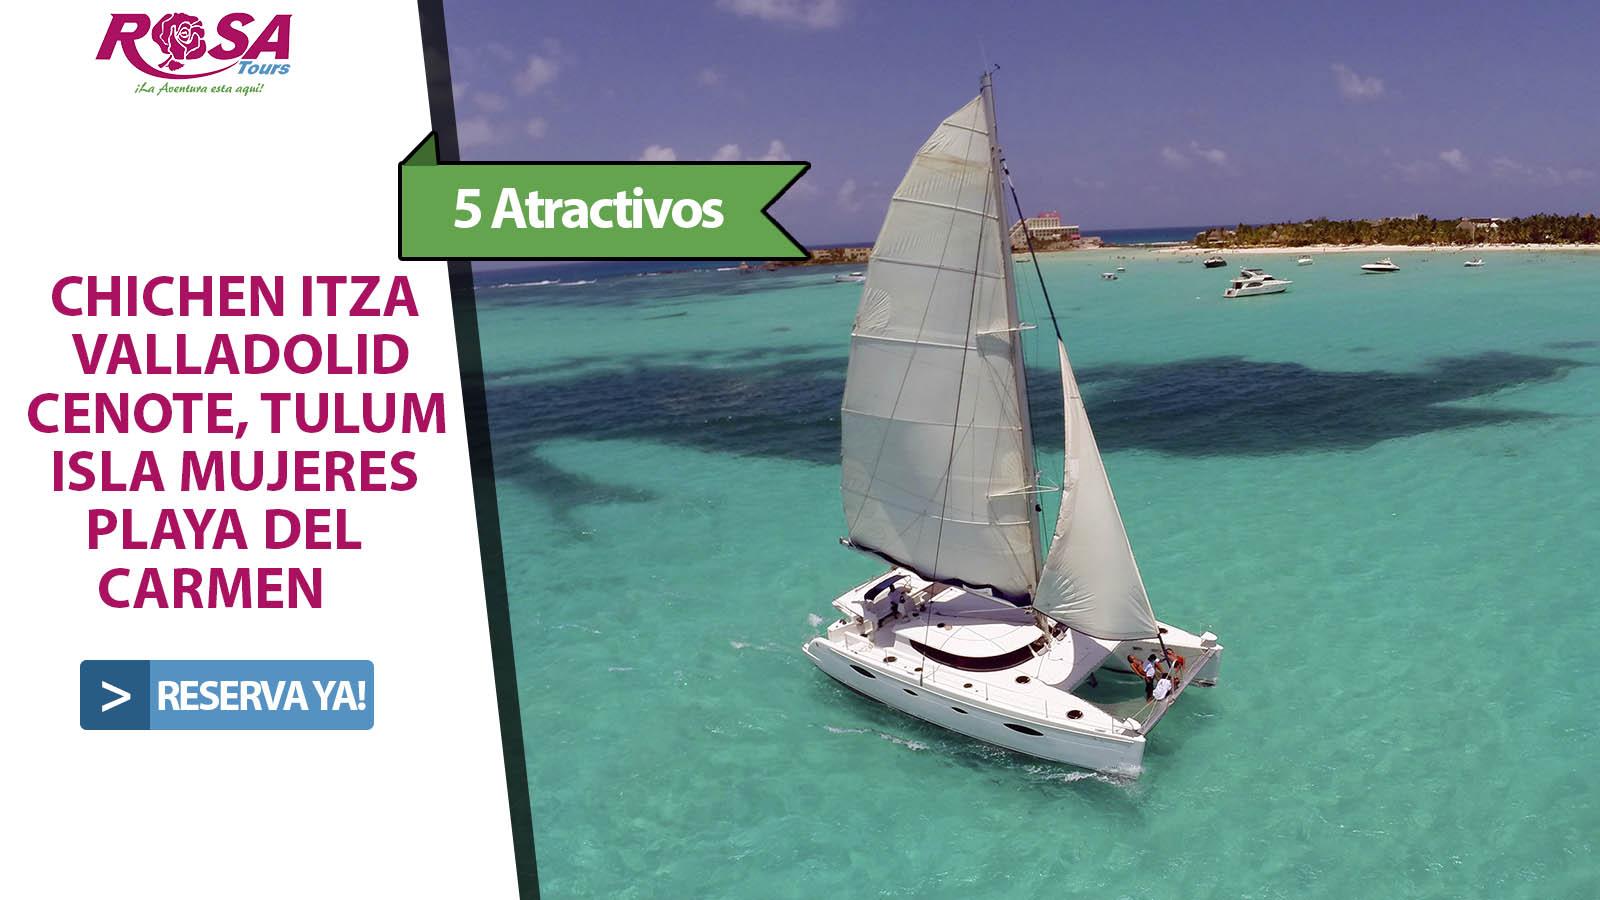 Chichen Itzá + Tulum + Playa del Carmen e Isla Mujeres plus